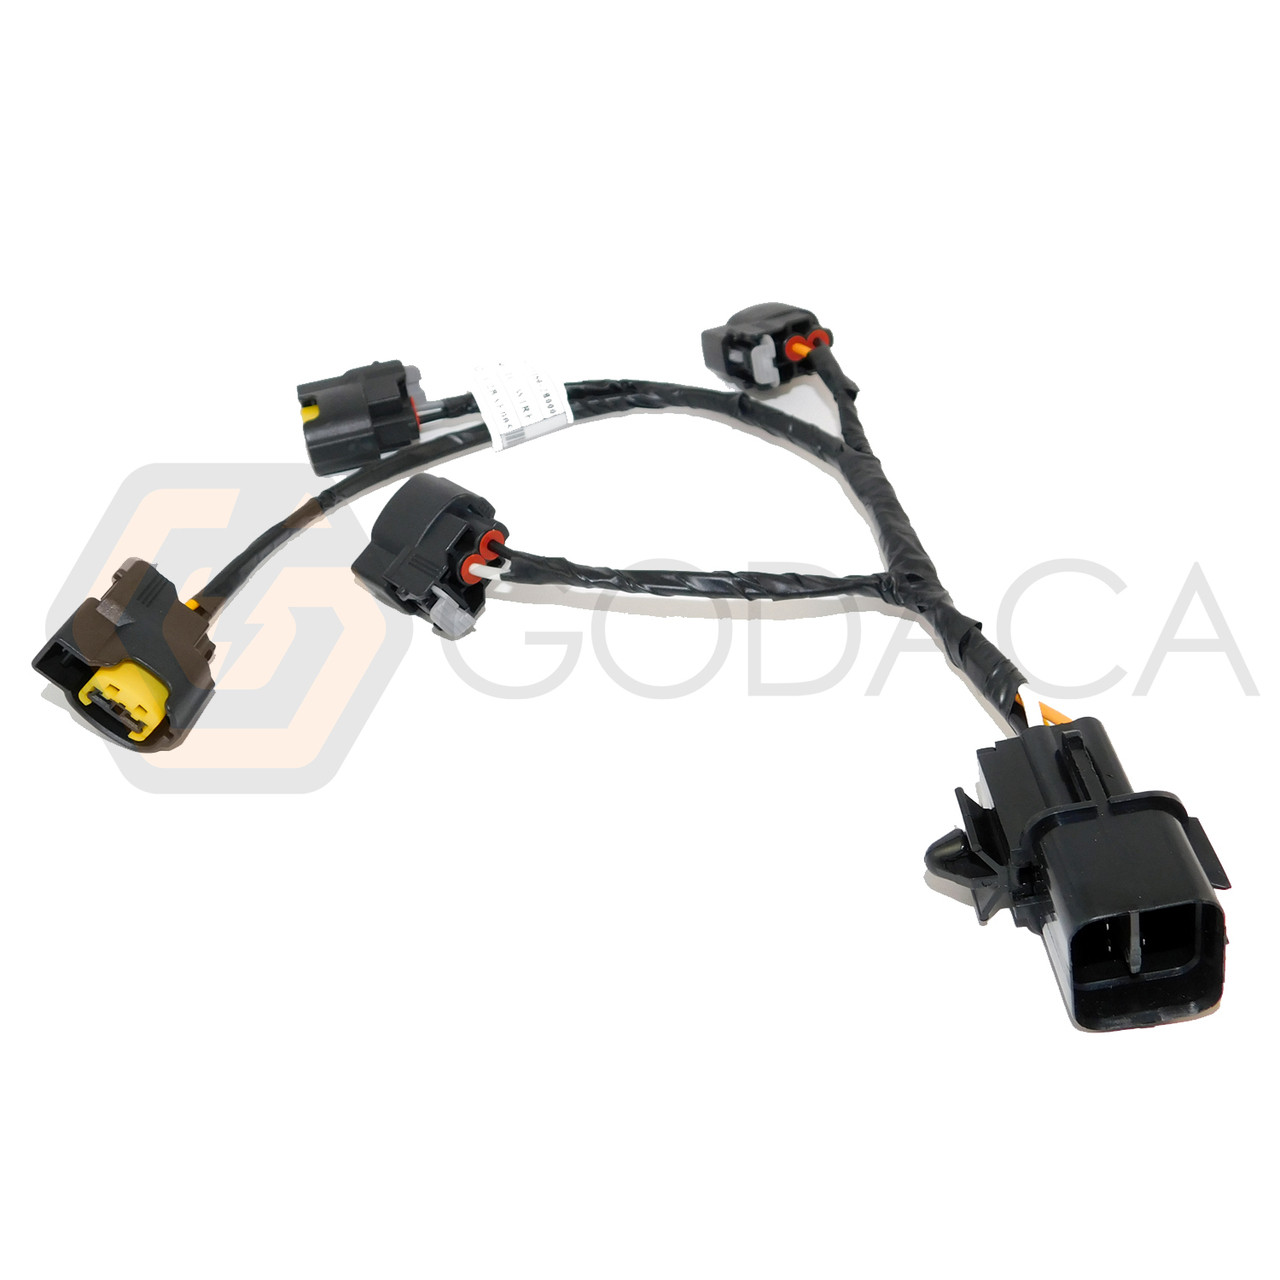 1x wiring harness for hyundai kia ignition coil 27350-2b000 - godaca, llc